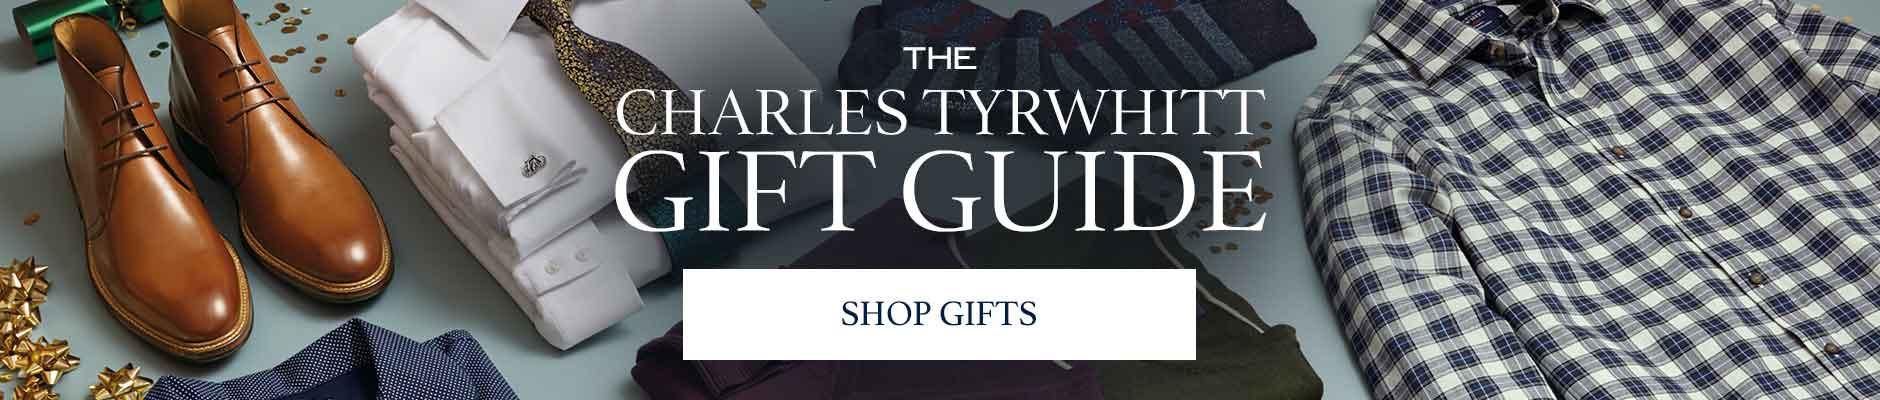 Charles Tyrwhitt Gifts